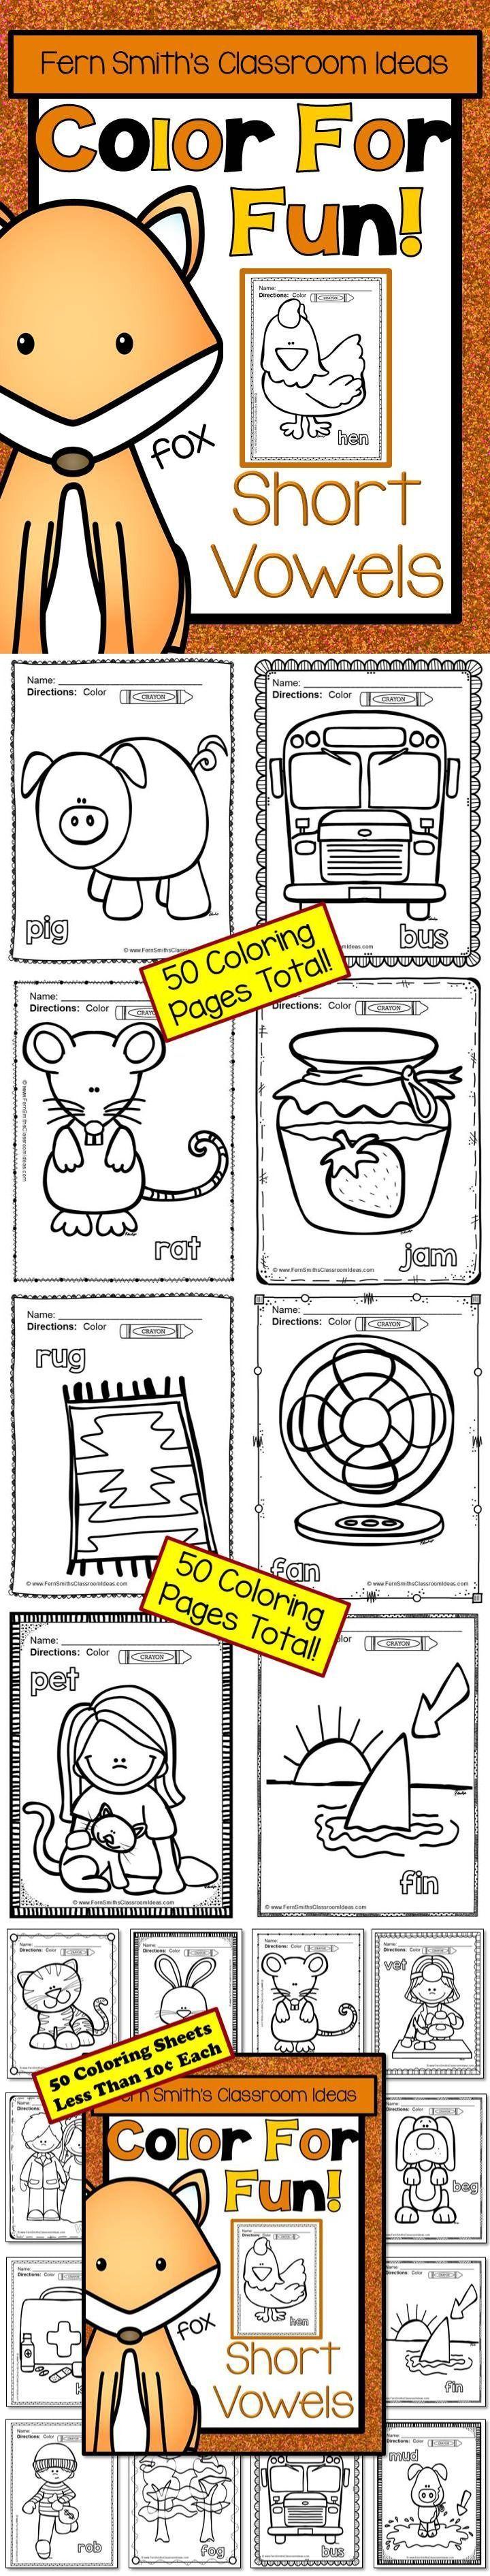 short vowels coloring pages - photo#33